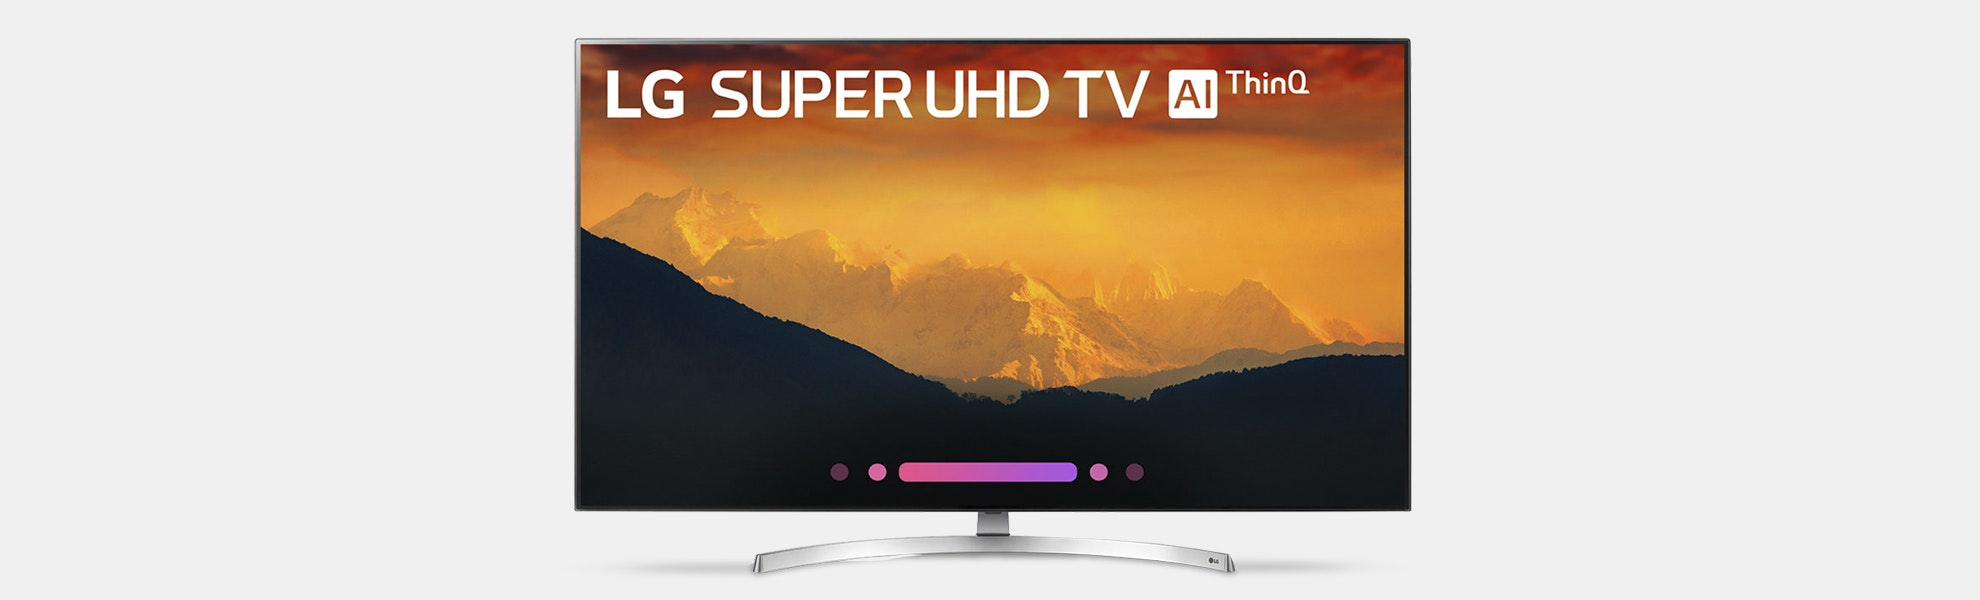 "LG 55/65"" SK9000PUA ThinQ Super UHD AI TVs"